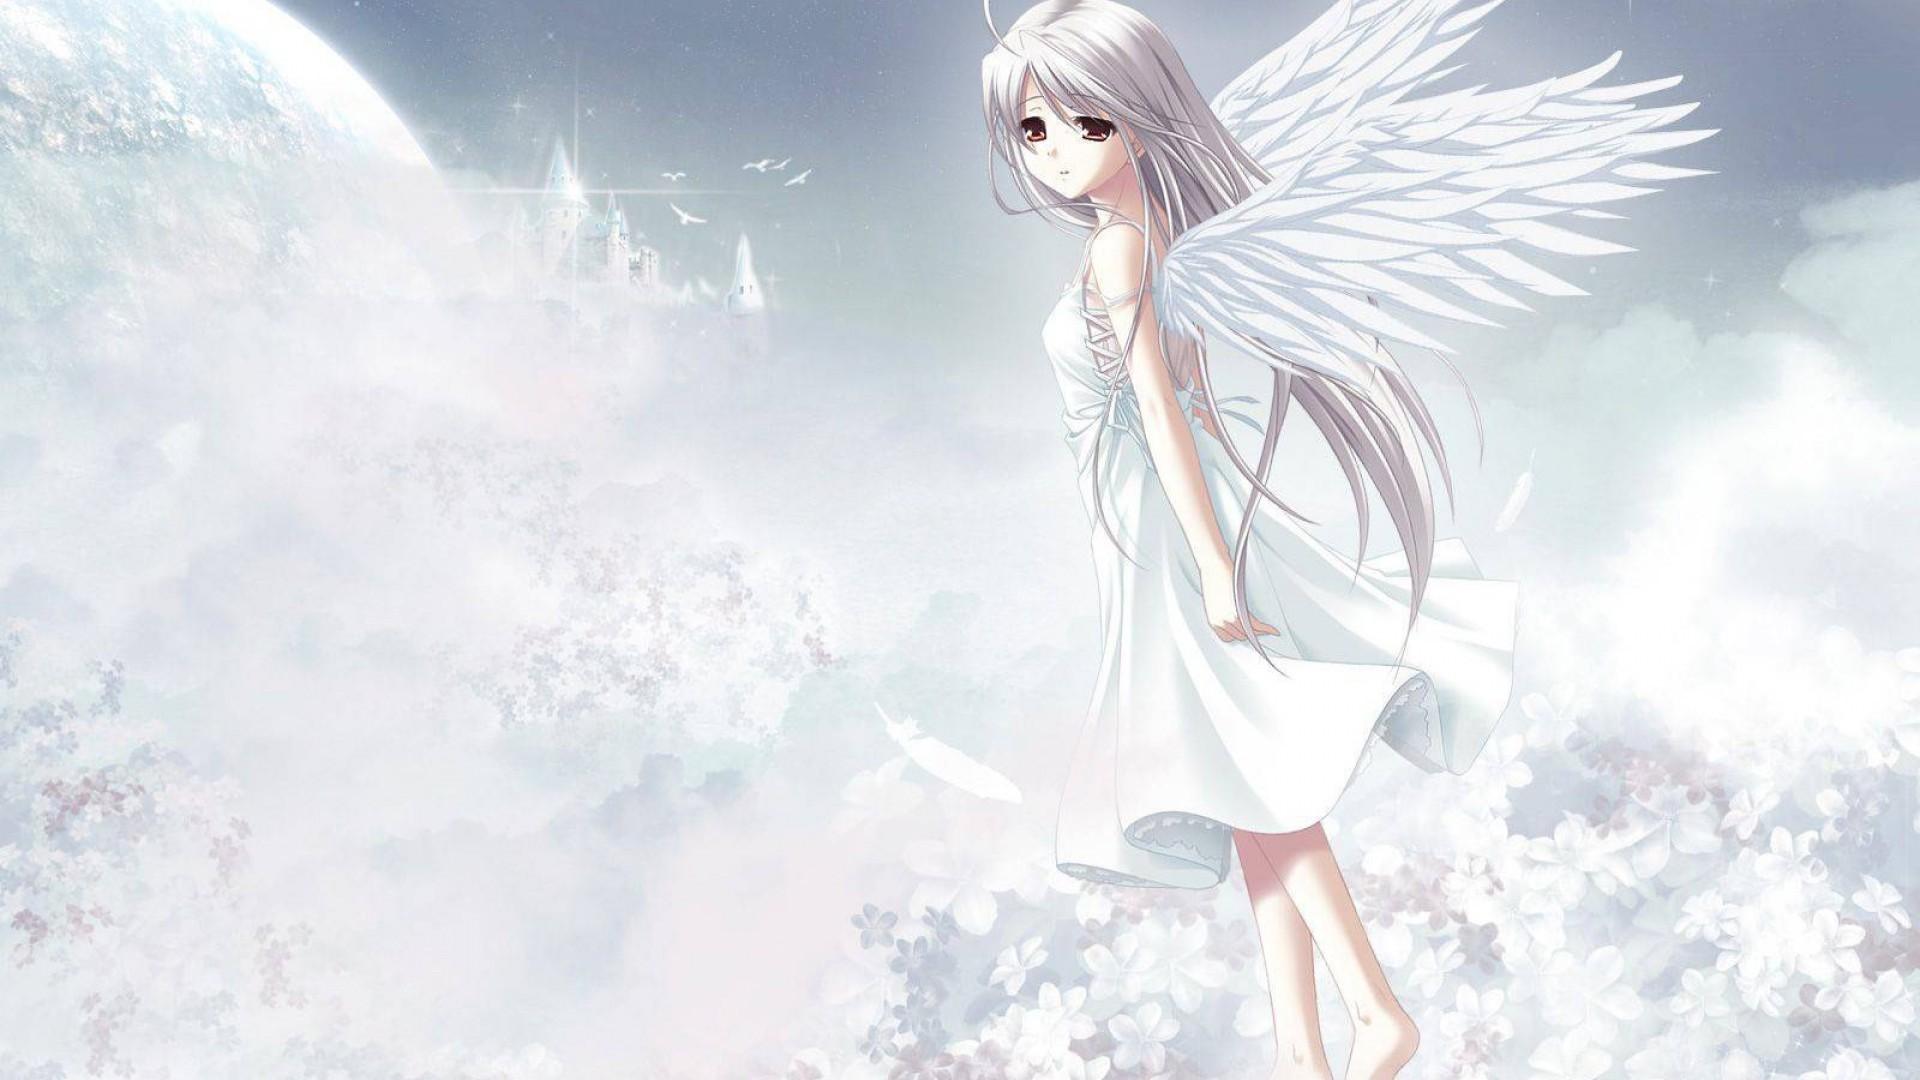 Cute Anime Angel Girl HD Wallpaper – Stylish HD Wallpapers